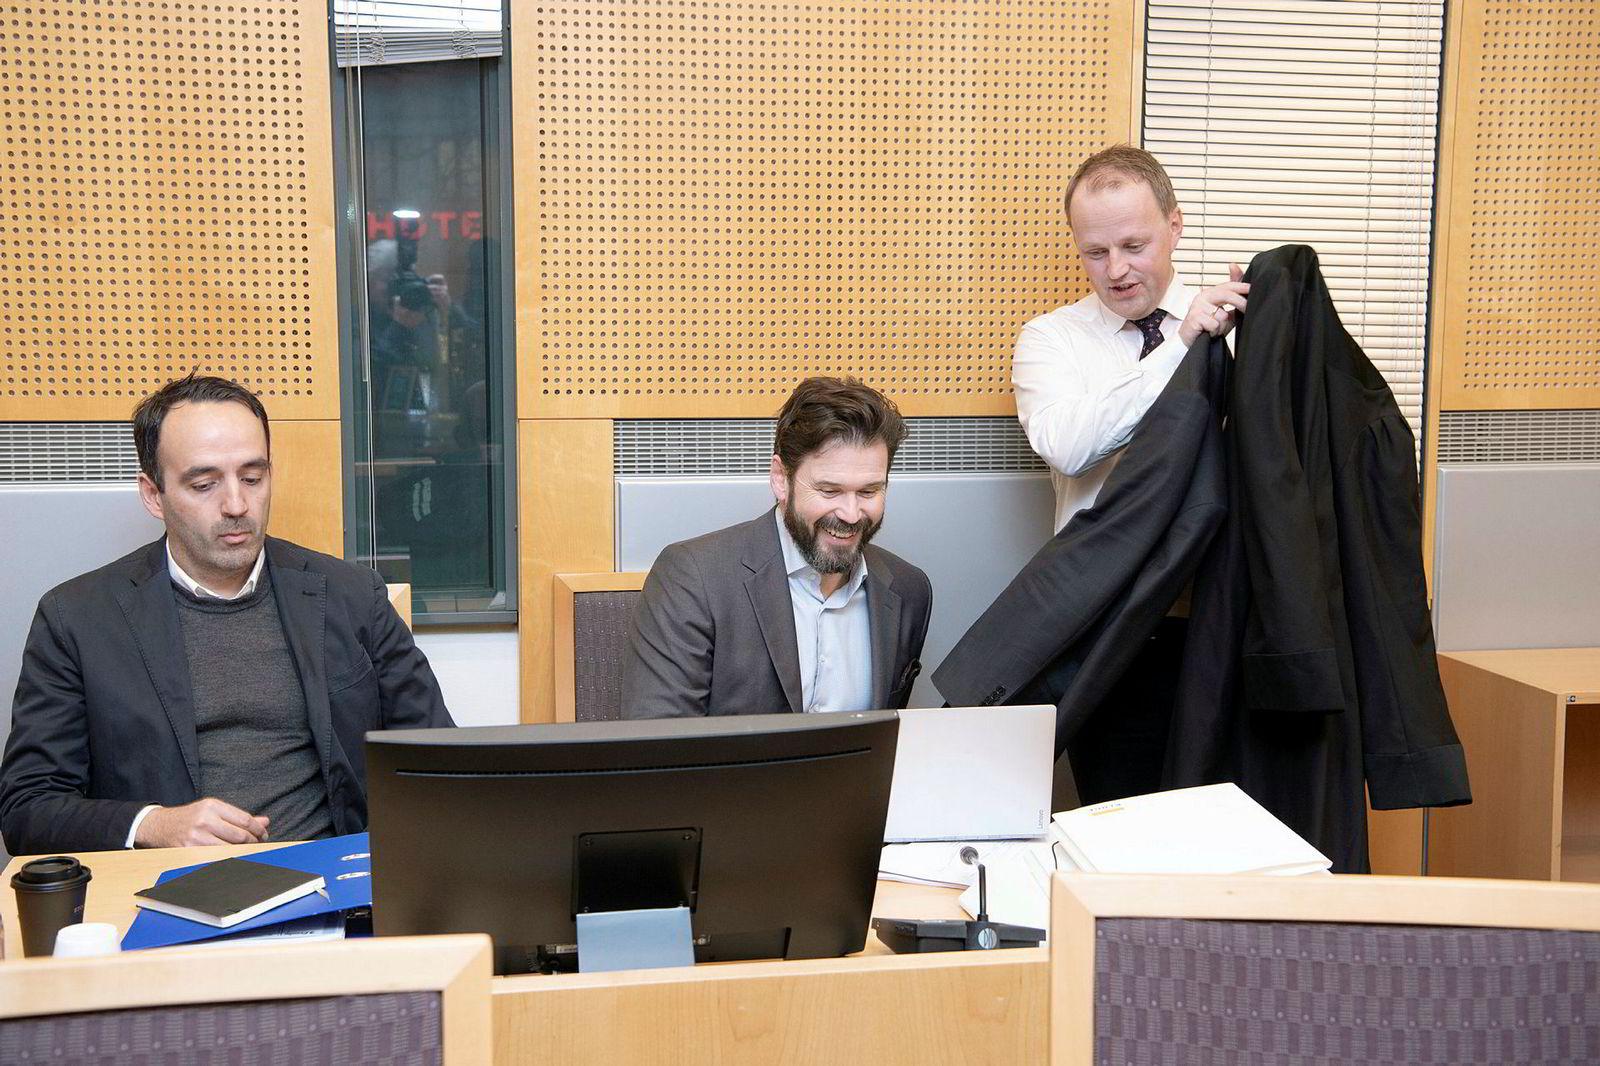 – Det har vært en lang og meget plagsom reise, sier Fredrik Sneve (til venstre). Her sammen med Karl Heine Ulvebne (i midten) og deres advokat Hans Ingvald Stensholt.